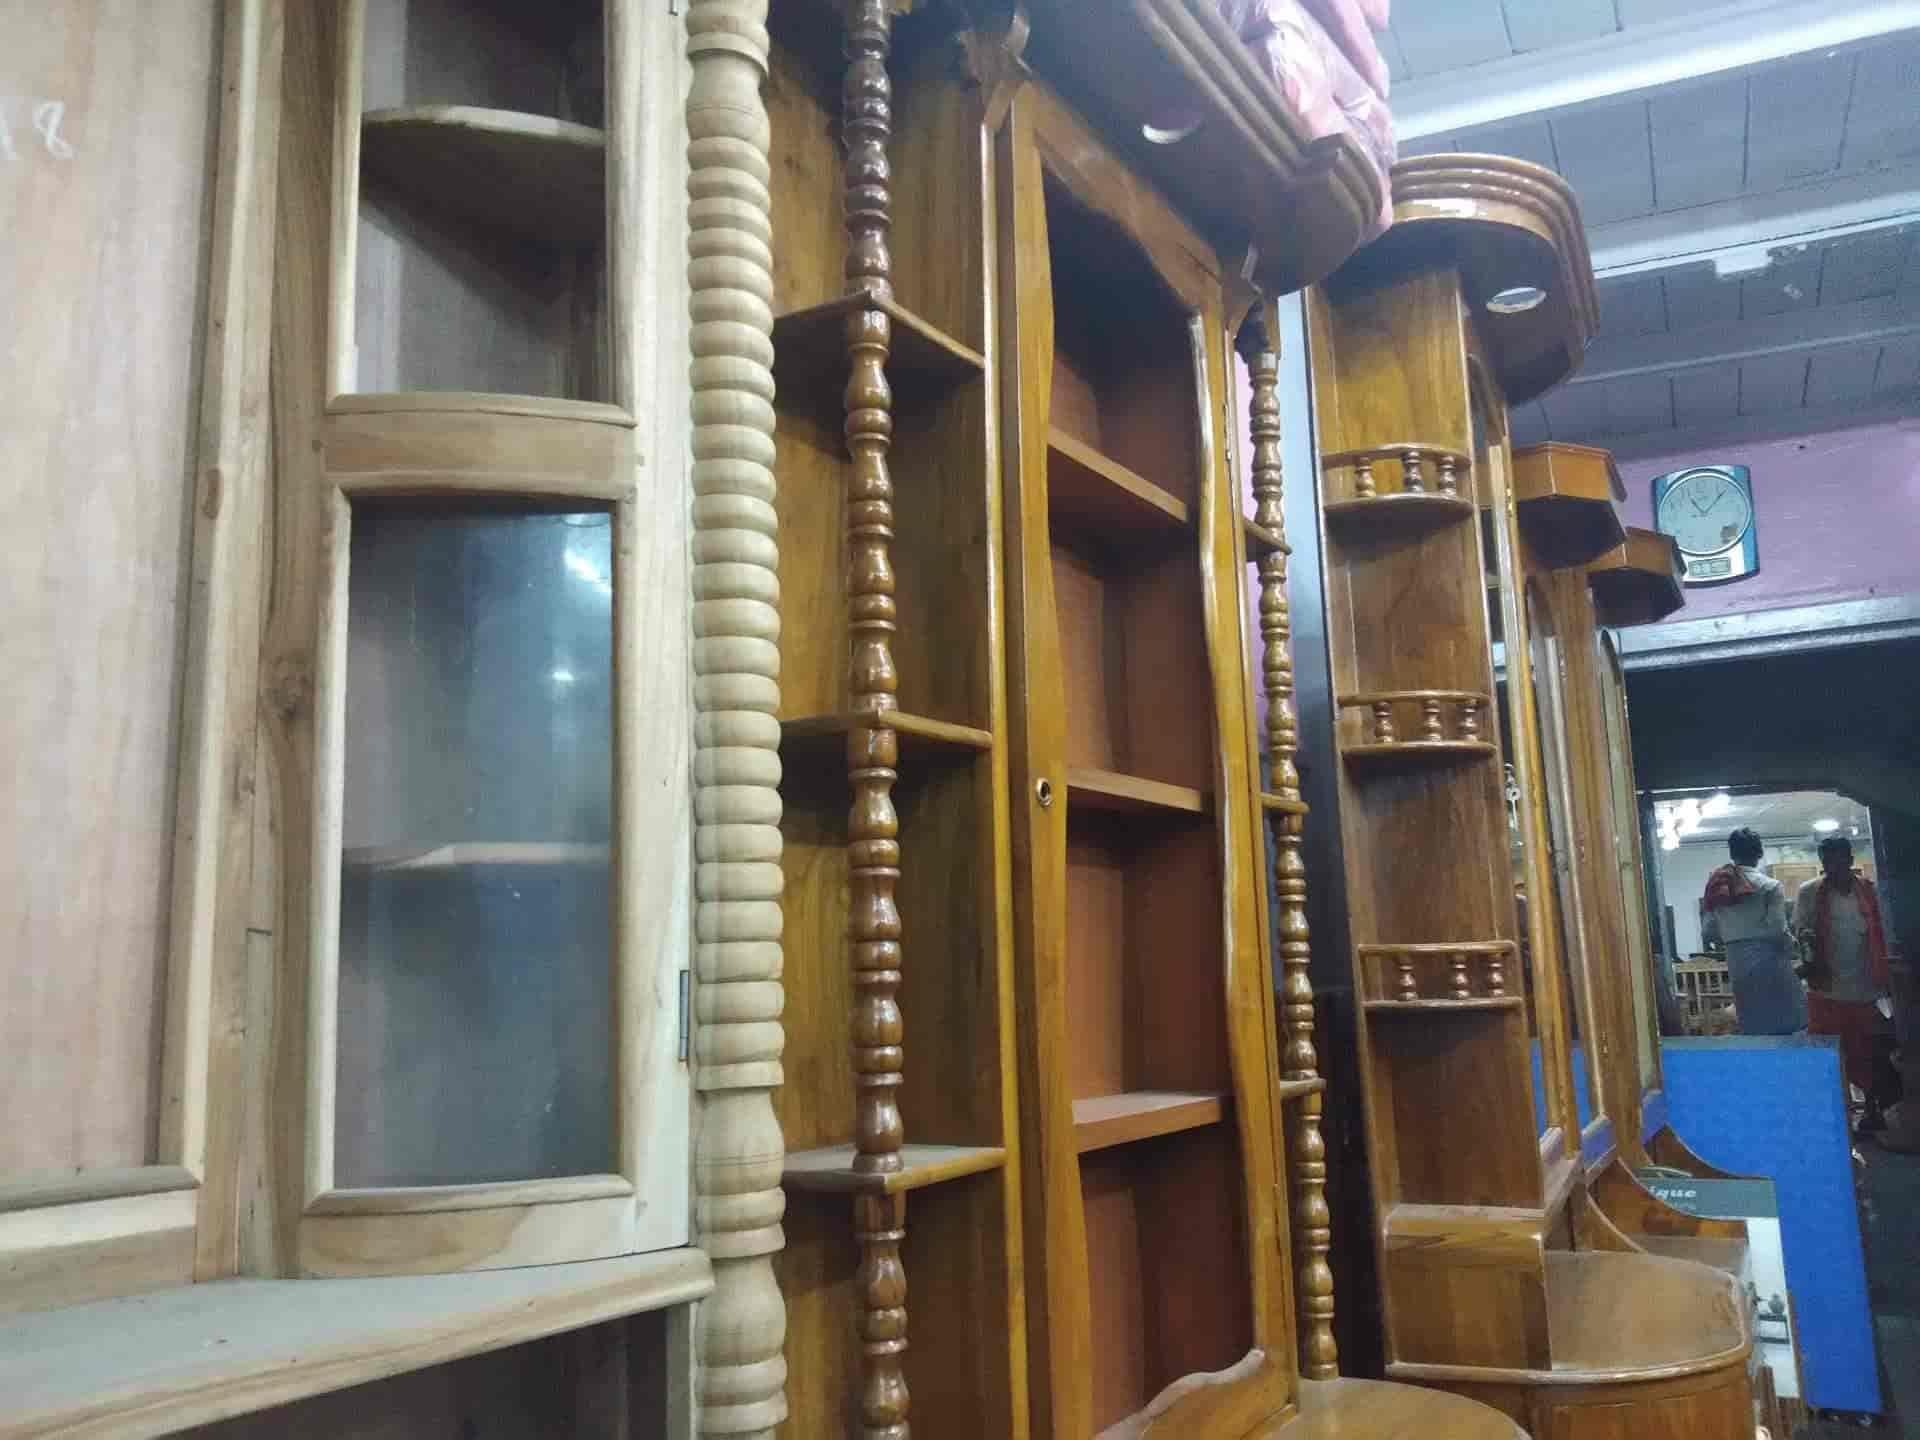 Western Furniture Photos Bowbazar Kolkata Pictures Images